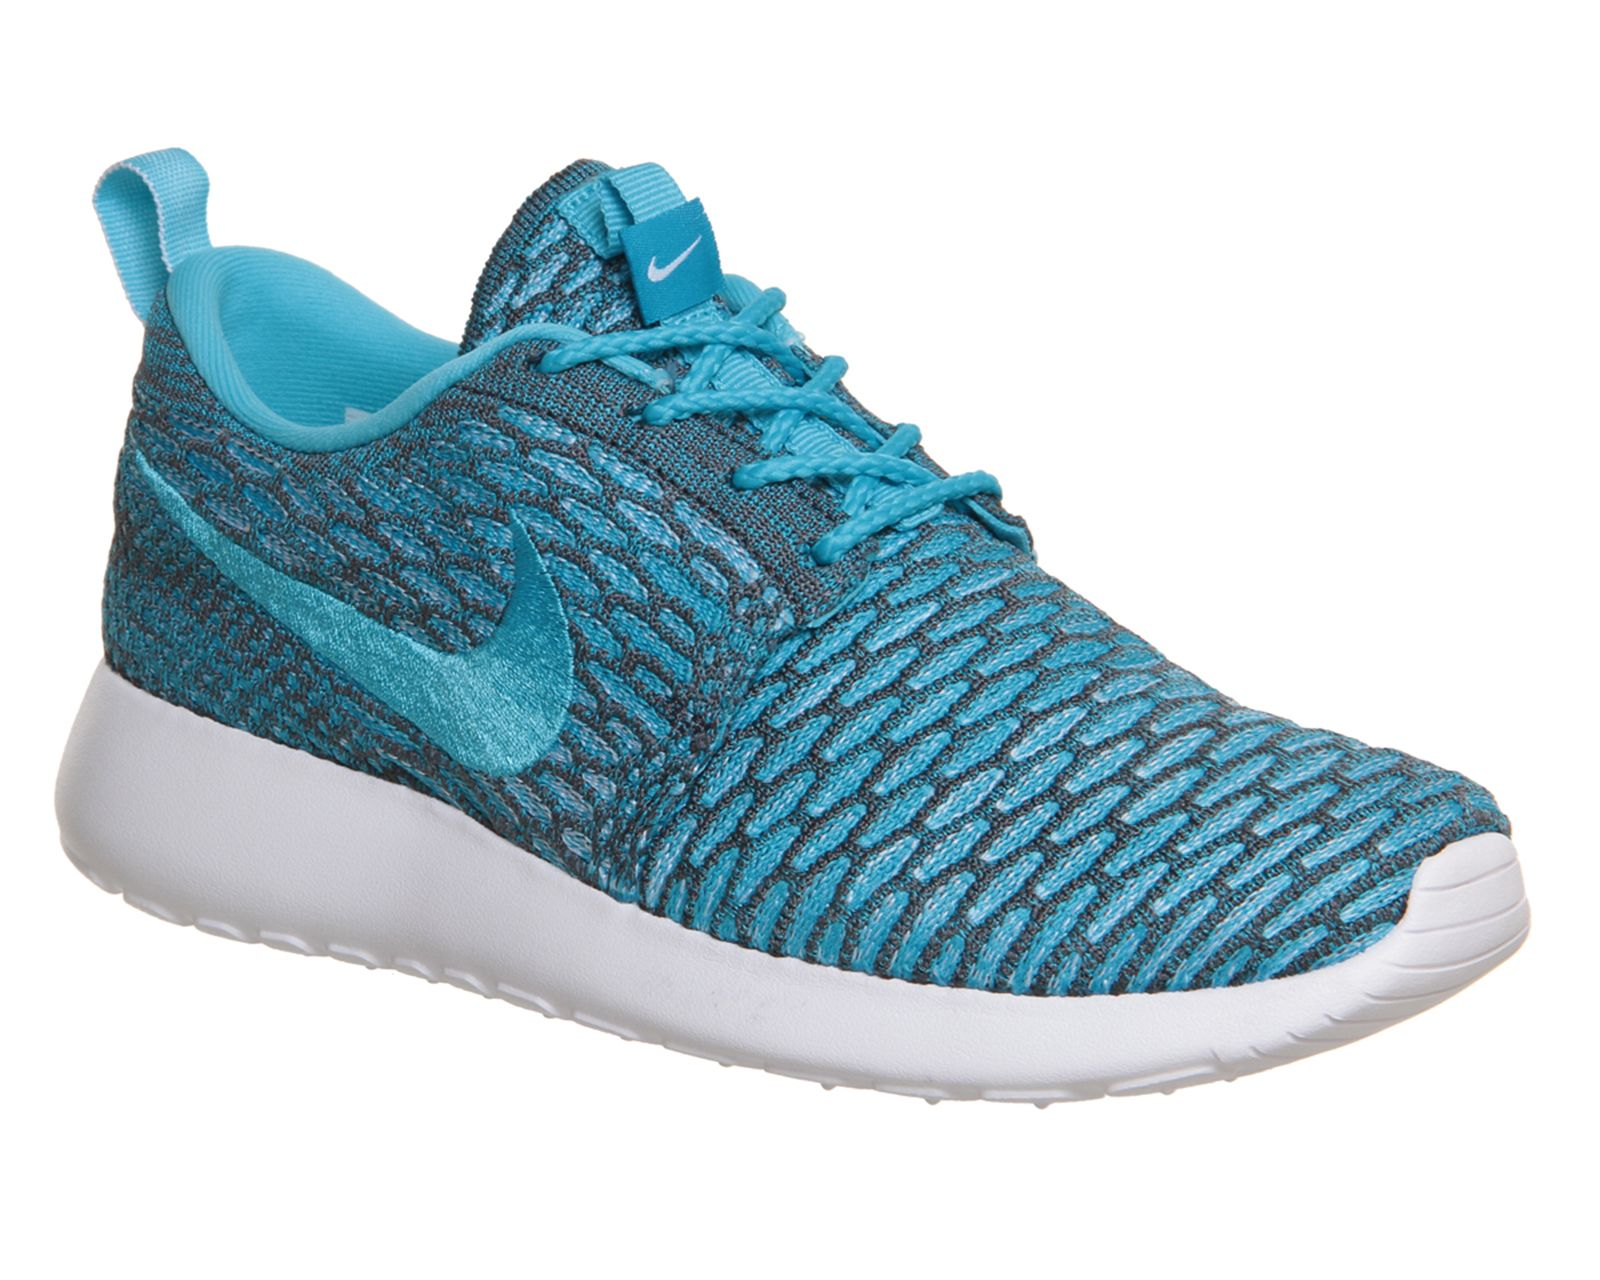 Nike Roshe Run Flyknit Green Grey Trainers